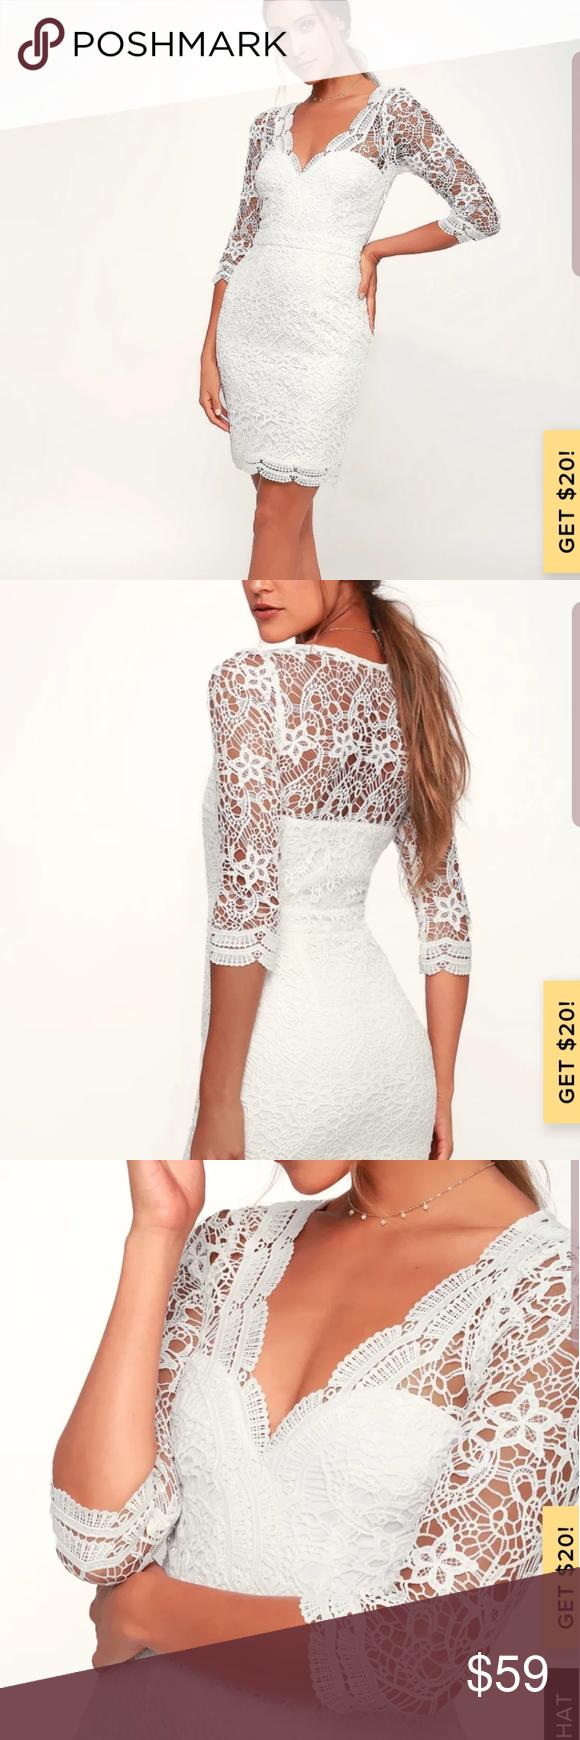 Lulu S Rainey White Lace Long Sleeve Bodycon Dress White Lace Long Sleeve Bodycon Dress Dresses Long Sleeve Bodycon Dress [ 1740 x 580 Pixel ]